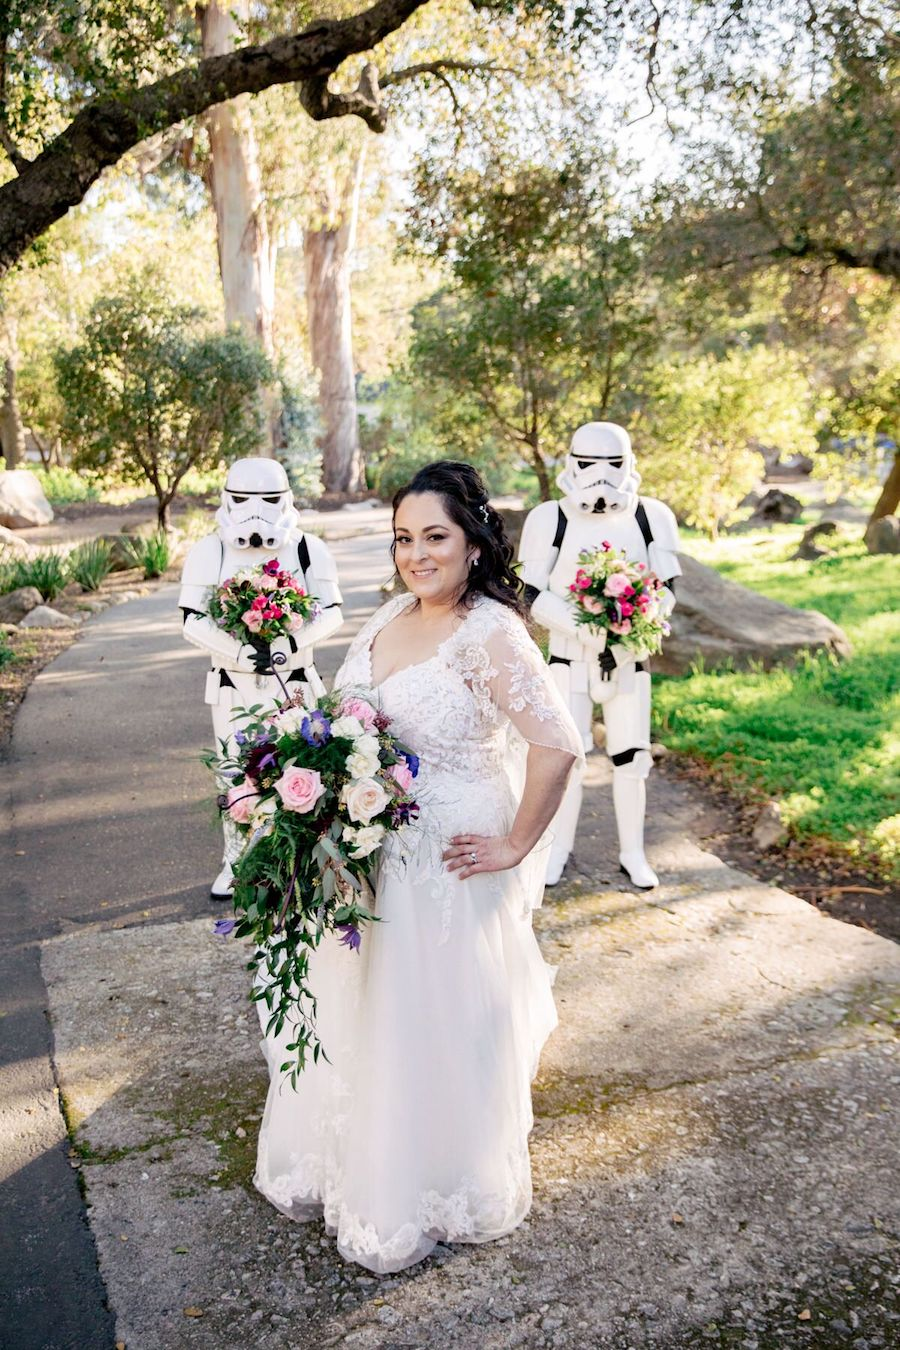 burlap-bordeaux-star-wars-wedding-santa-barbara-3.jpg